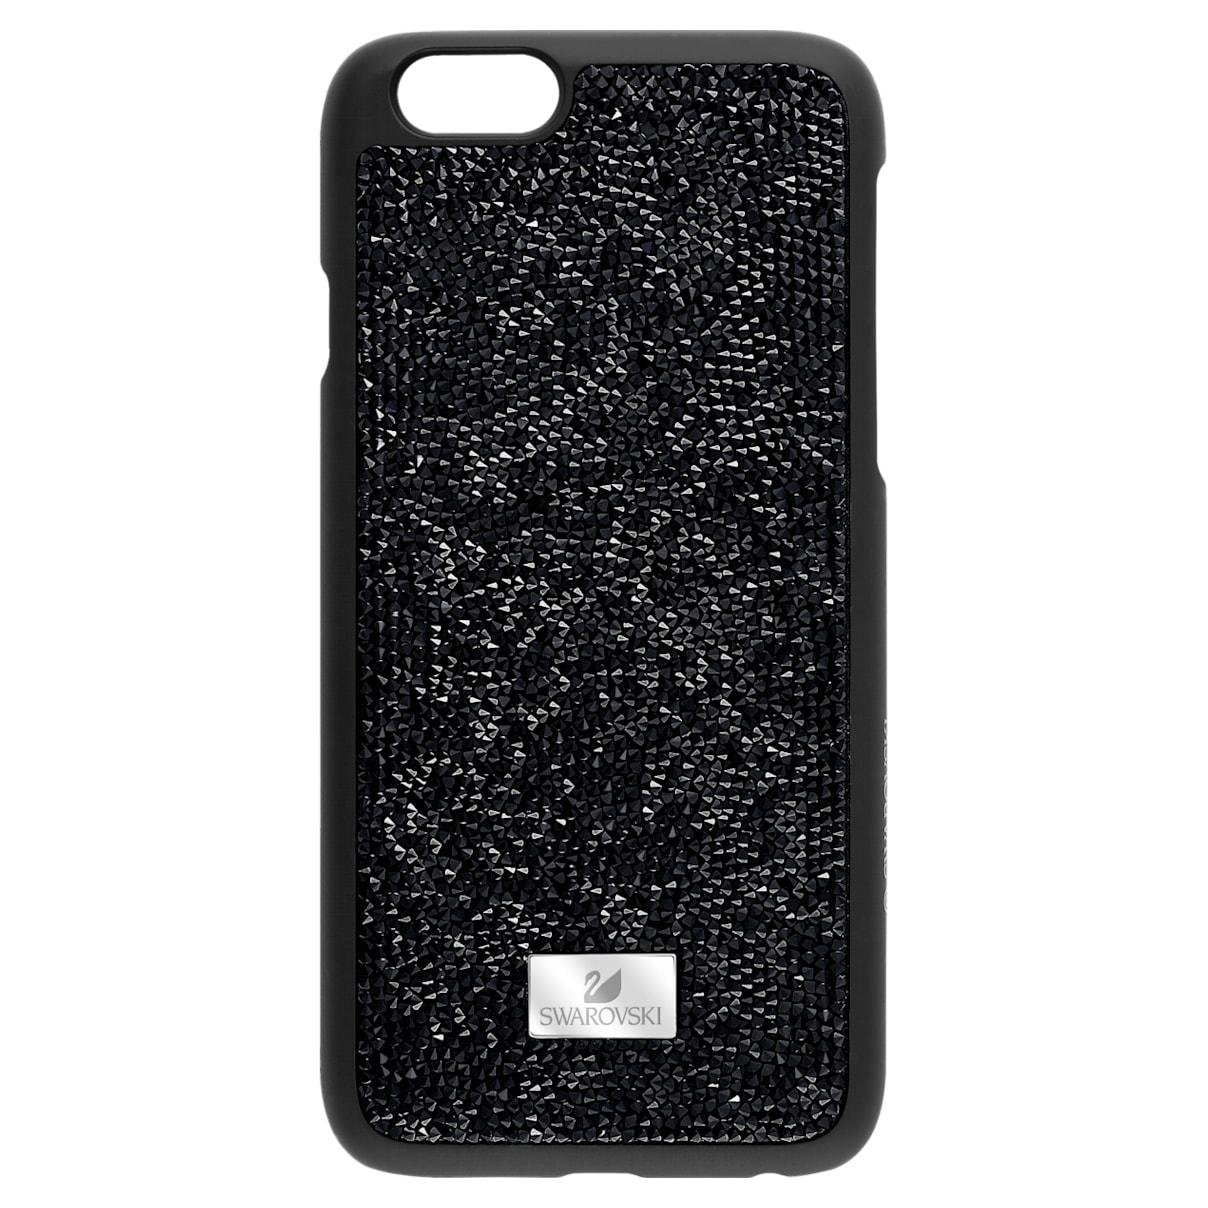 Glam Rock Black Smartphone Case with Bumper, iPhone® 6